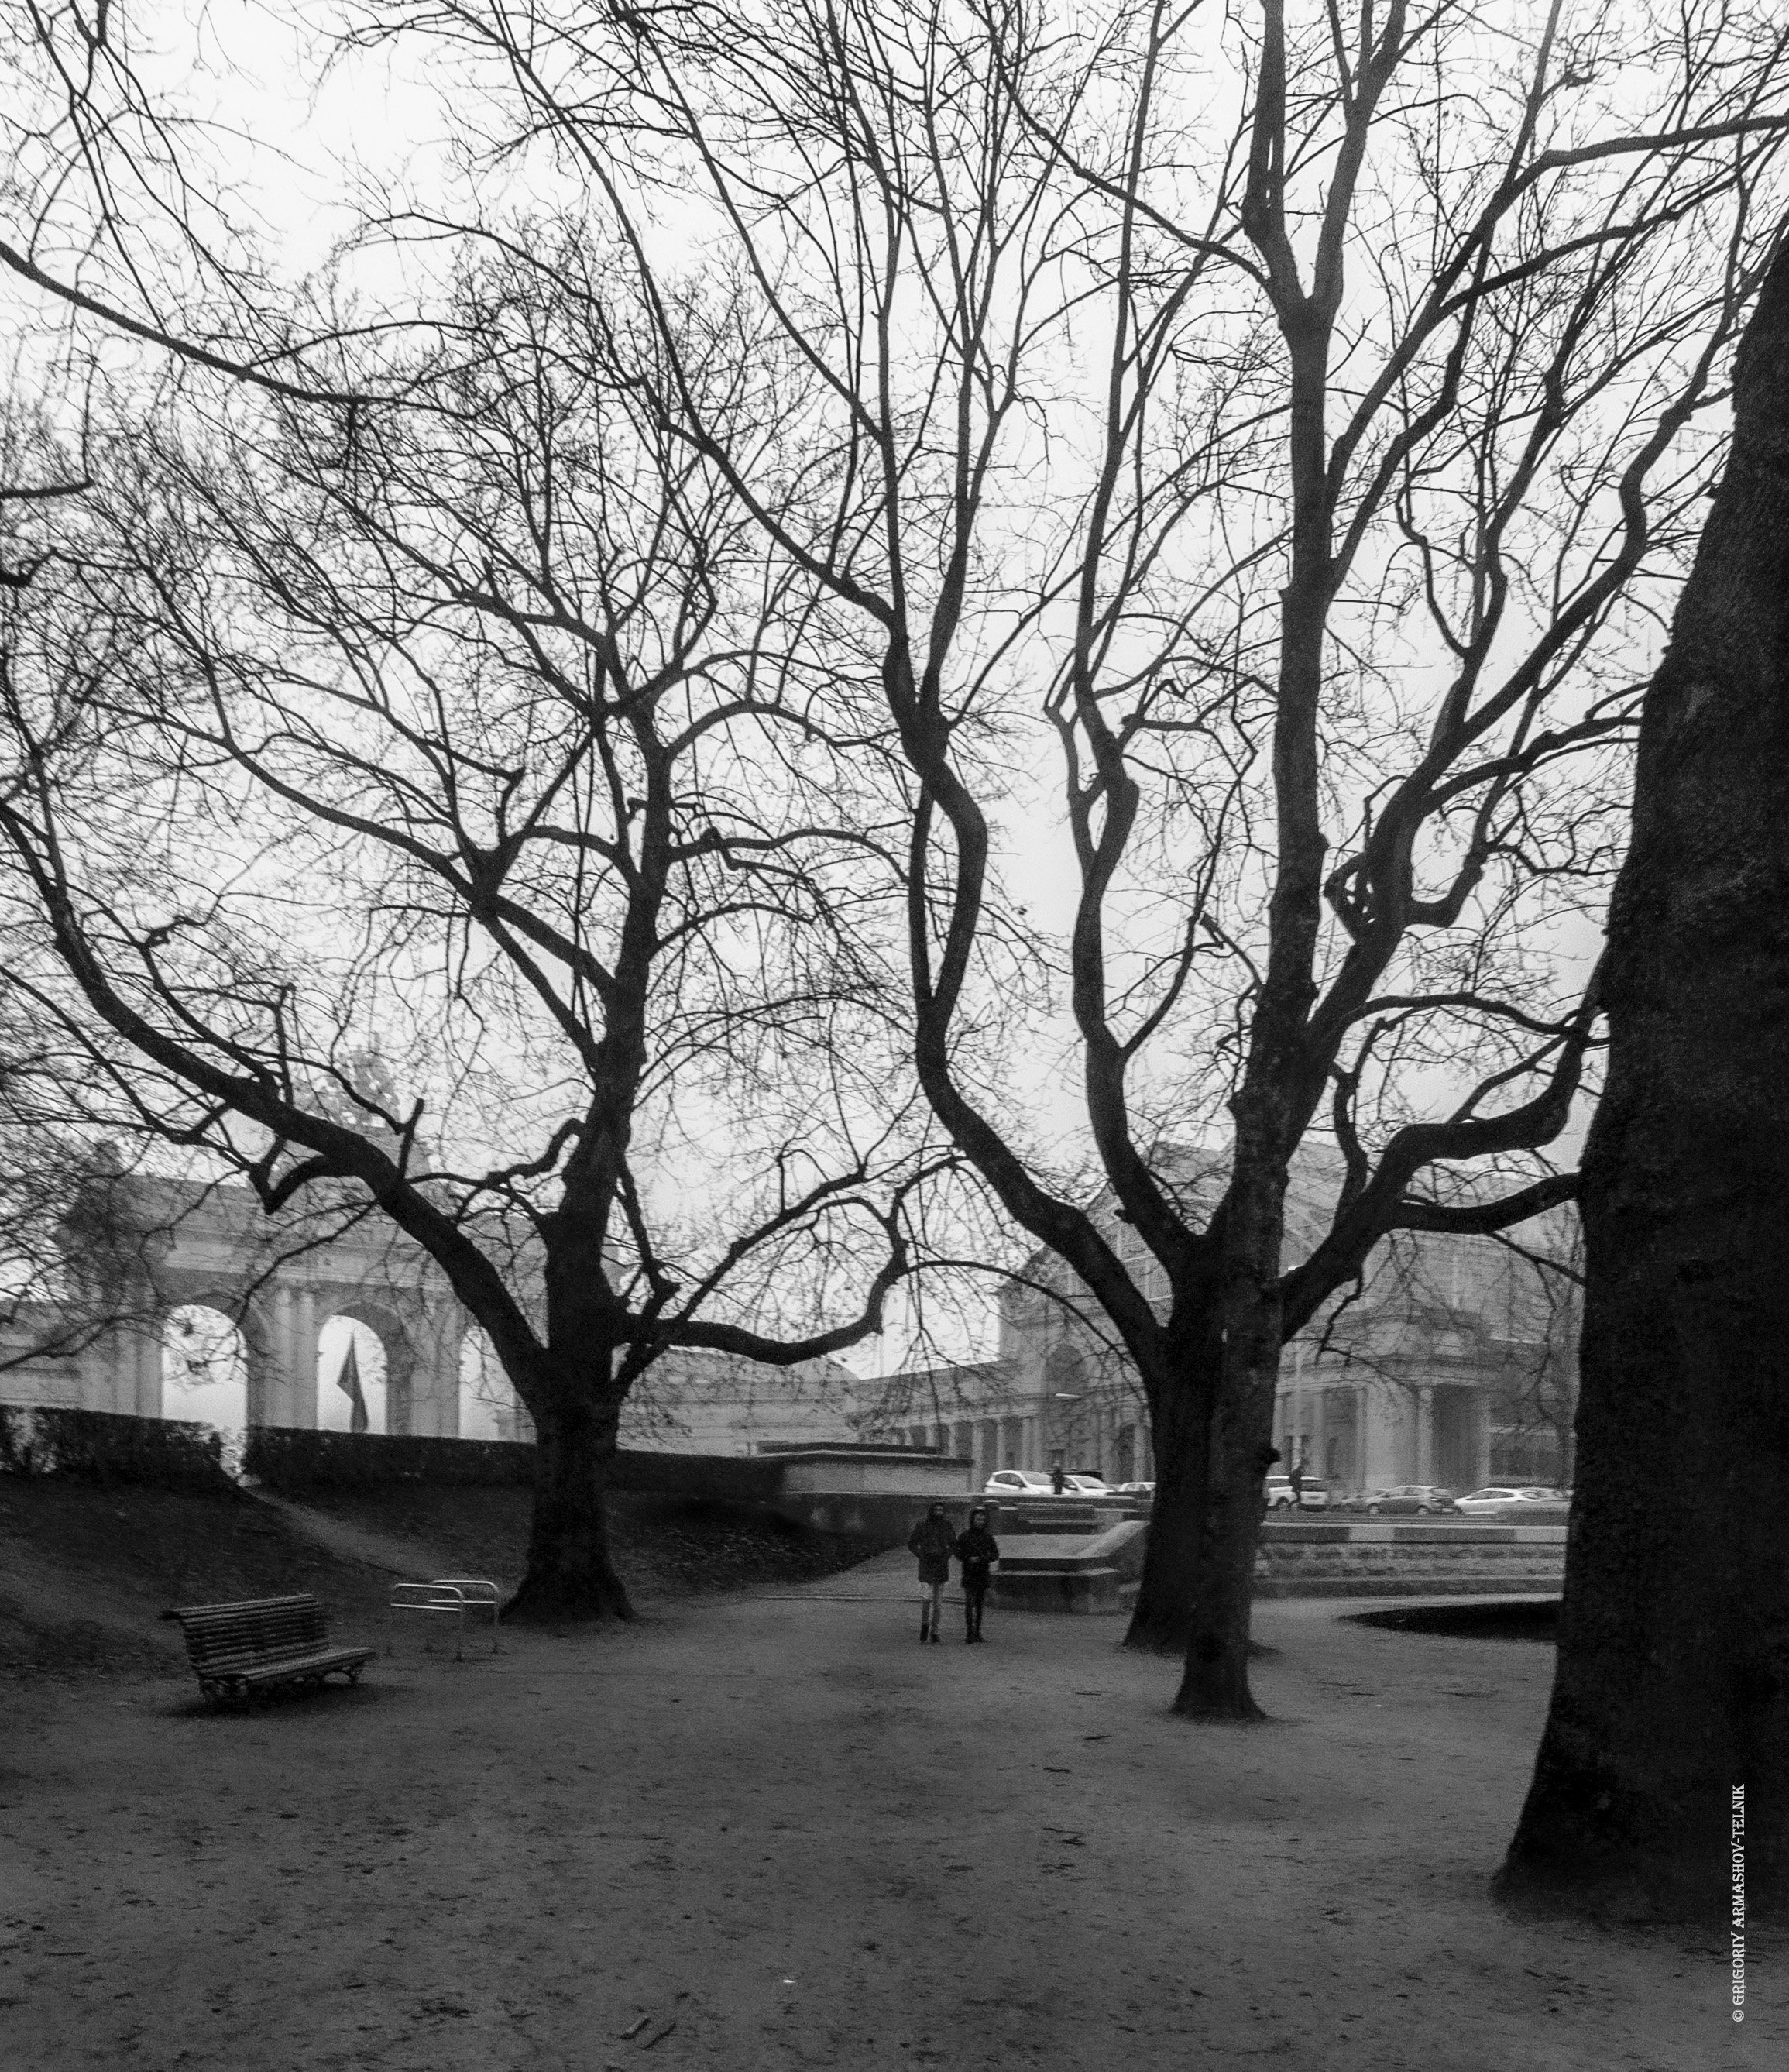 blackandwhite, monochrom, streetphotography, brussels, park, trees, walk, Армашов-Тельник Григорий